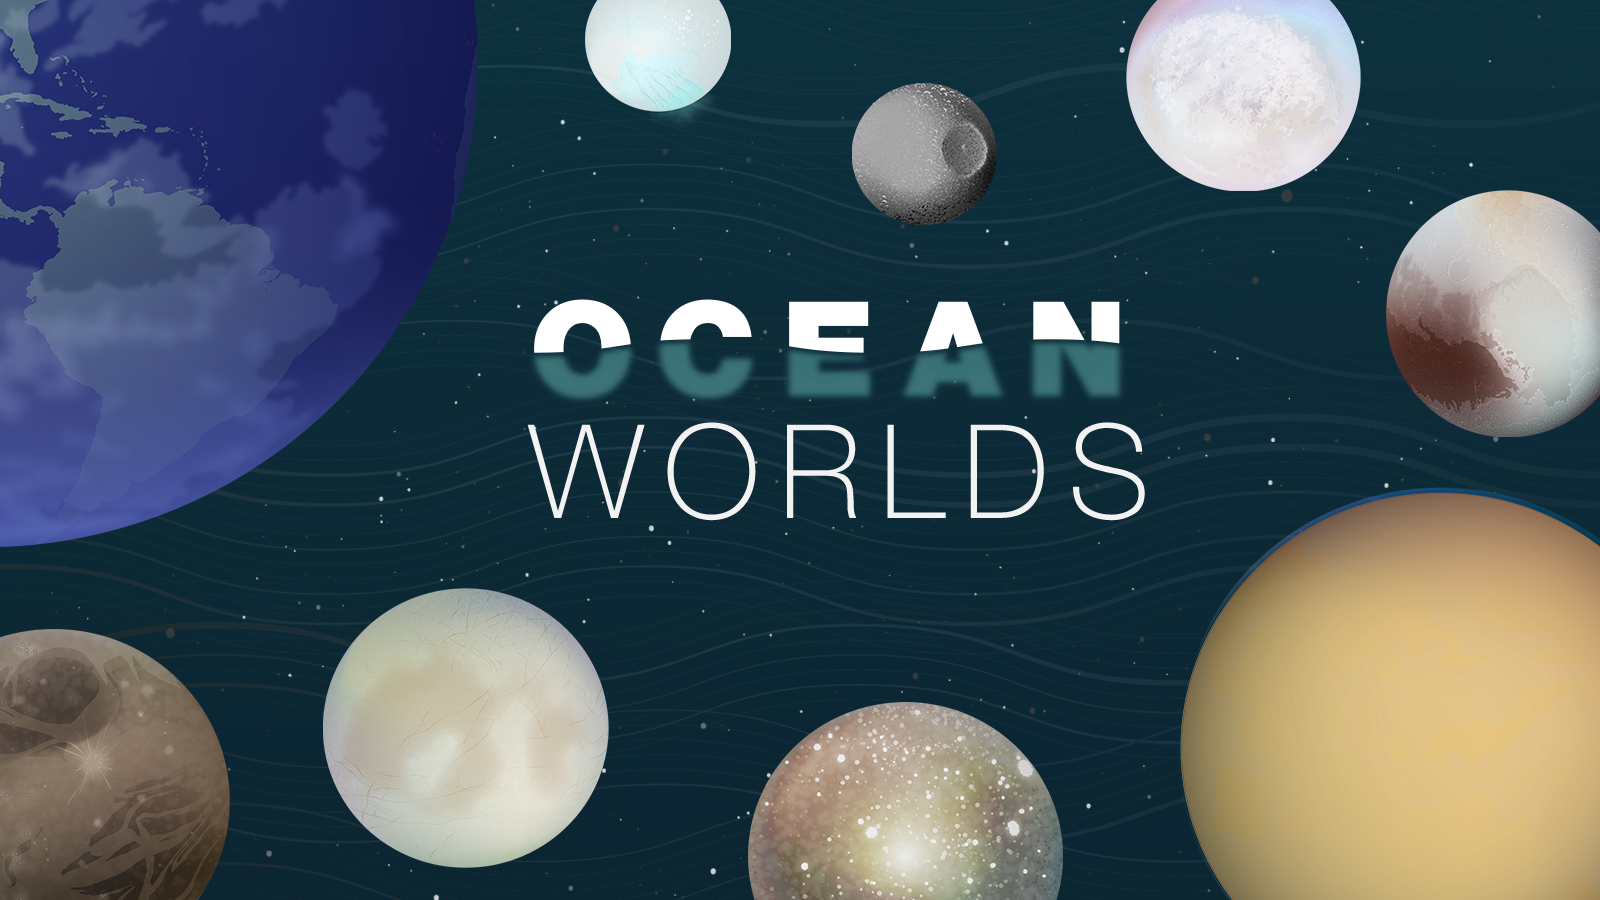 Ocean Worlds Slideshow Nasa Jpl Edu